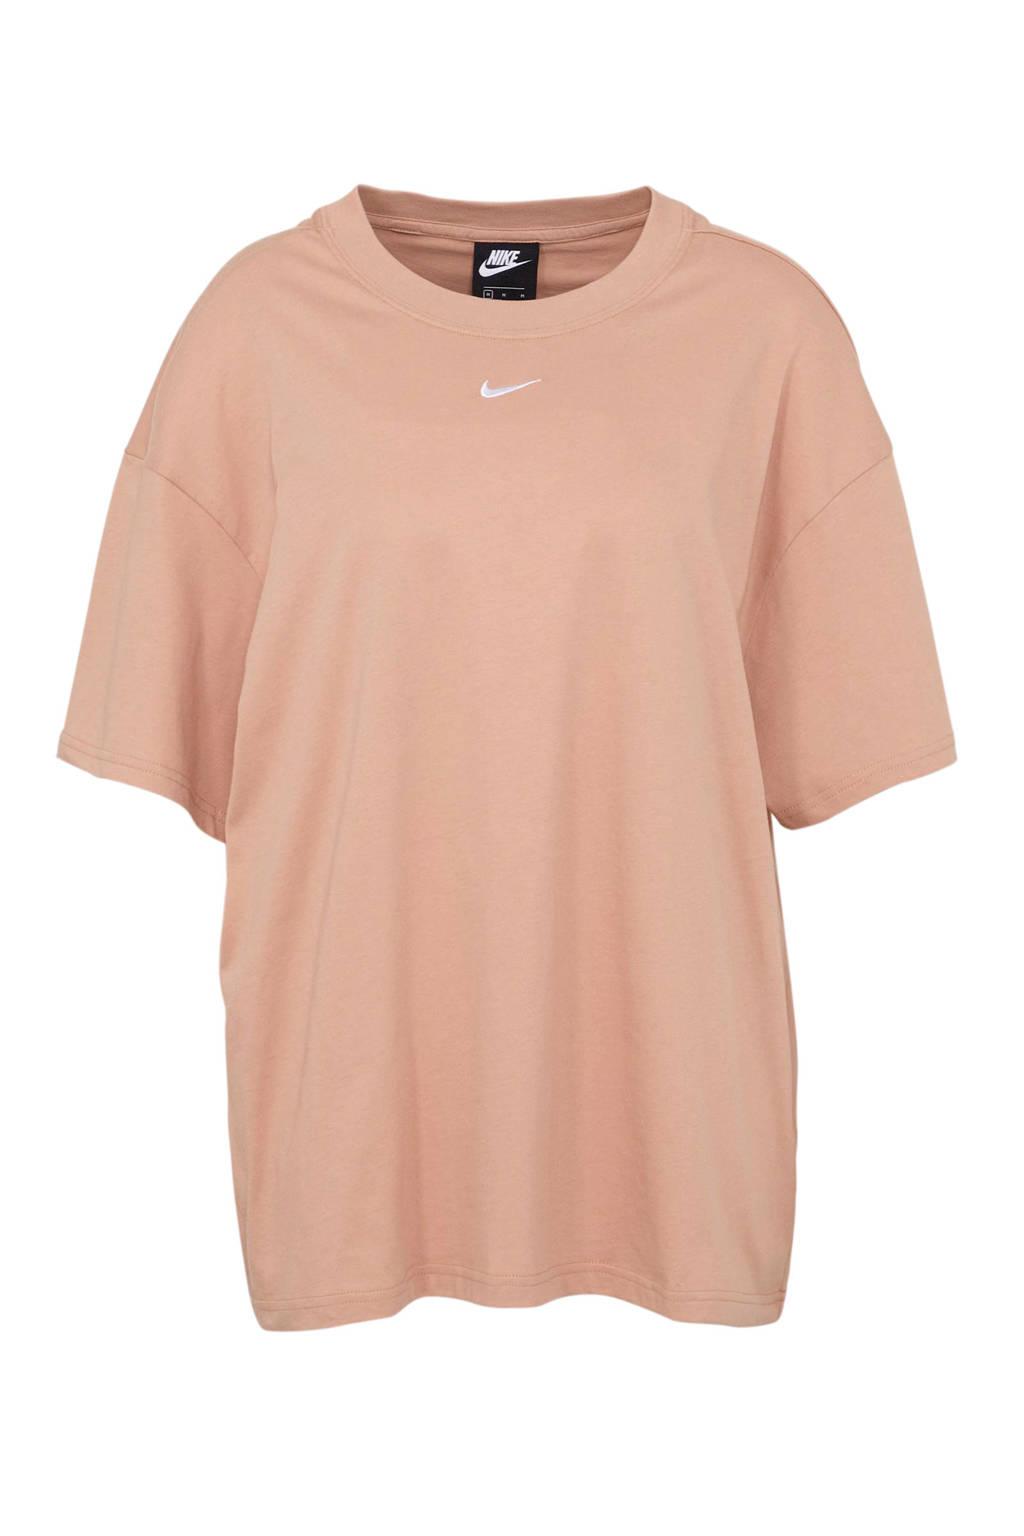 Nike oversized T-shirt oudroze, Oudroze